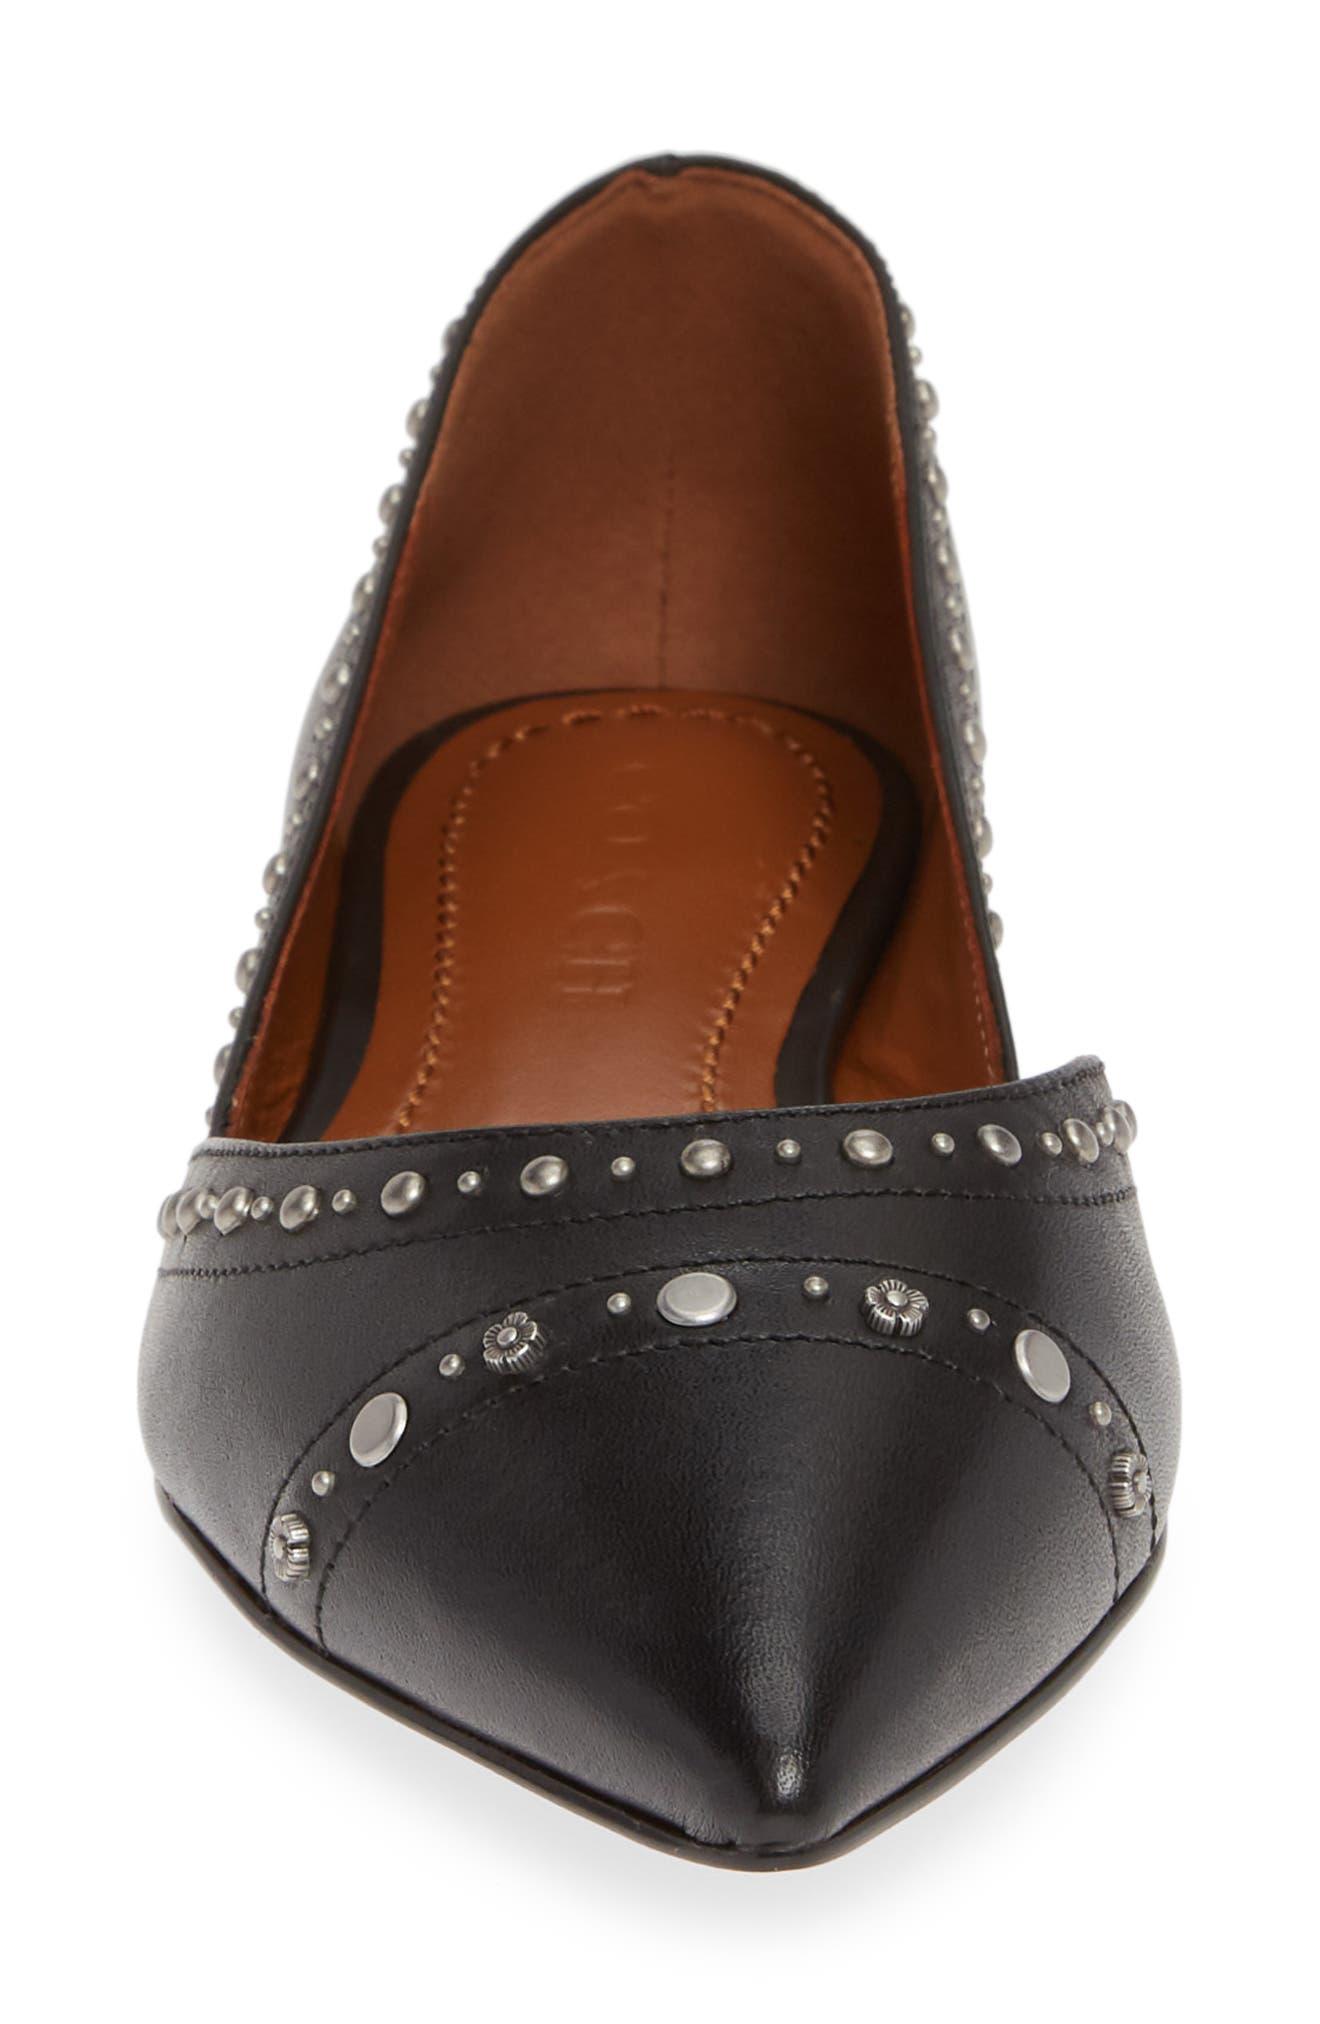 Valintina Pointed Toe Flat,                             Alternate thumbnail 4, color,                             BLACK LEATHER